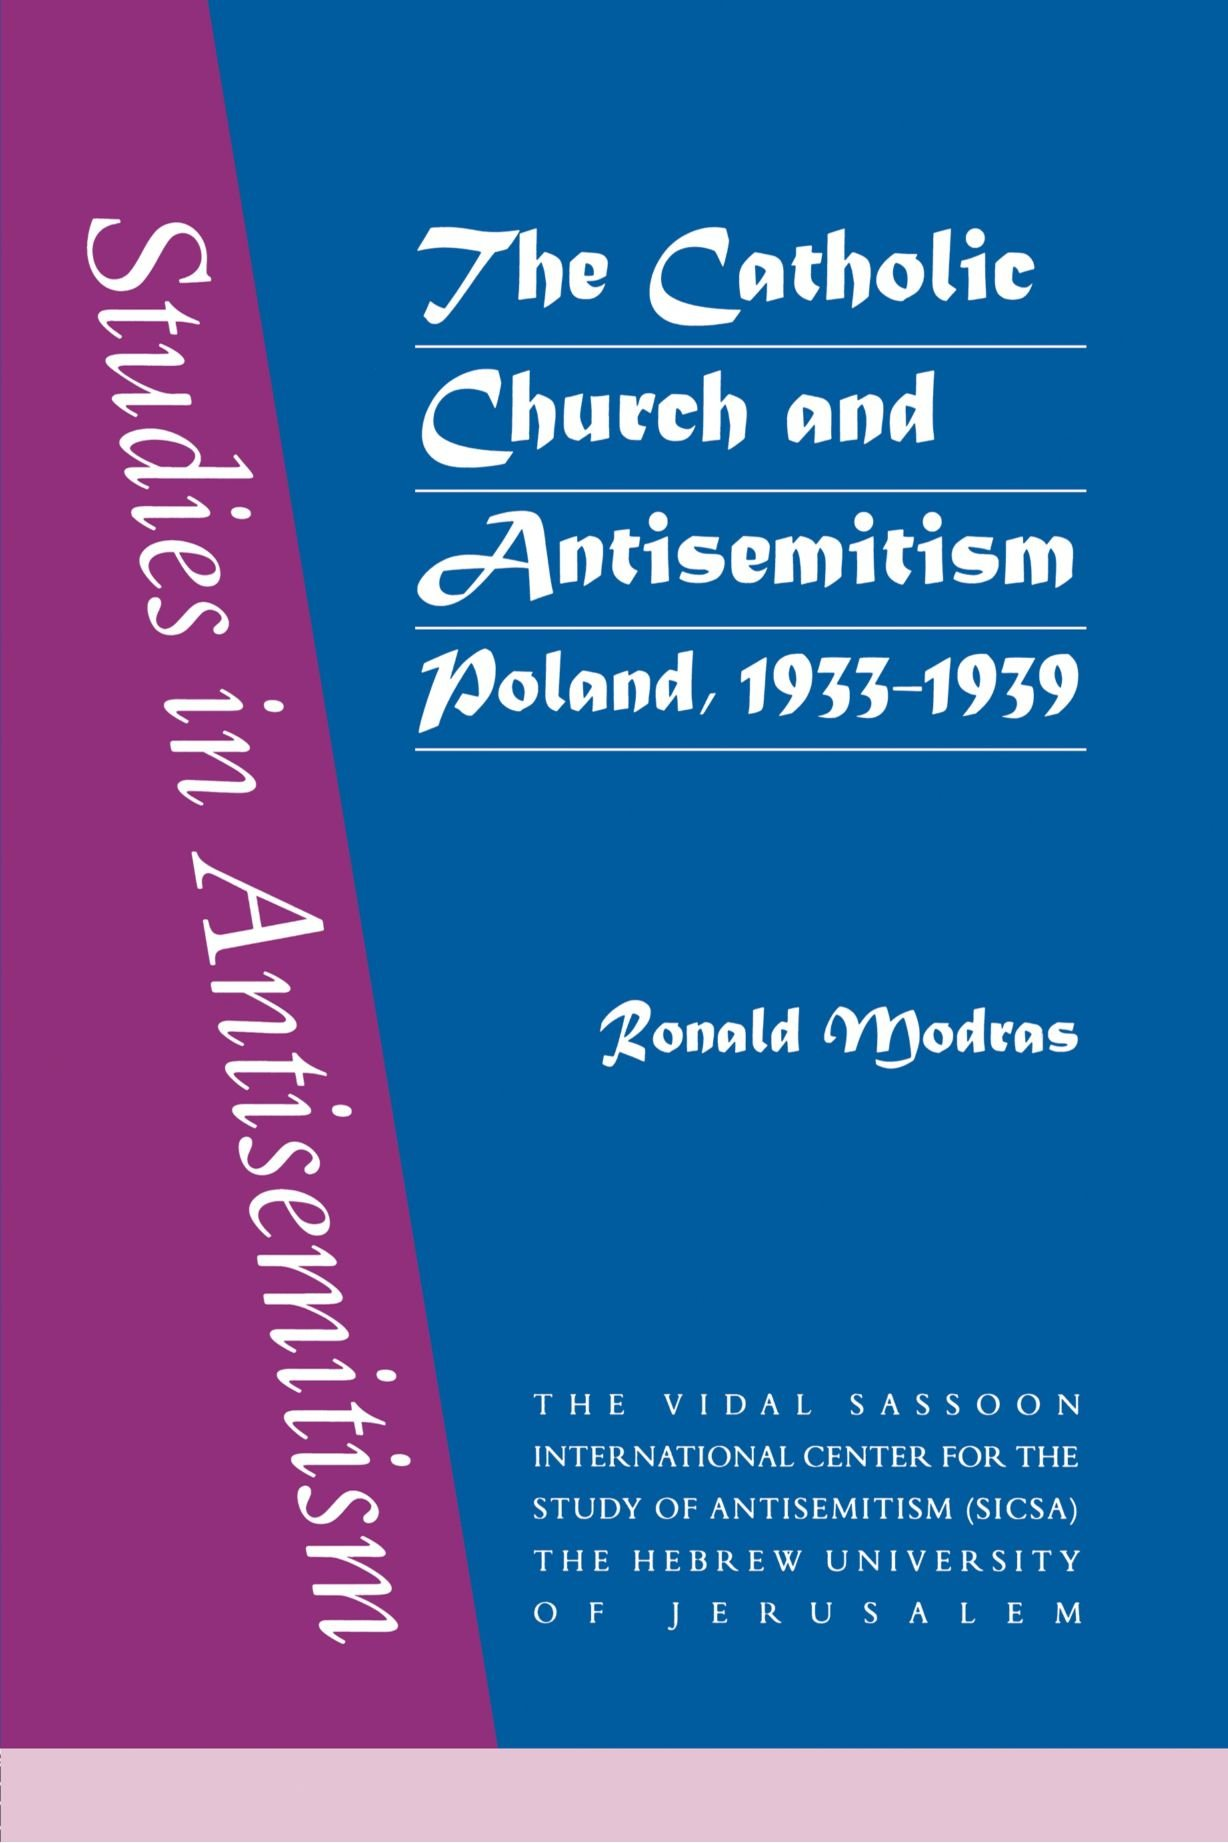 The catholic church and antisemitism ronald modras 9789058231291 the catholic church and antisemitism ronald modras 9789058231291 amazon books fandeluxe Gallery